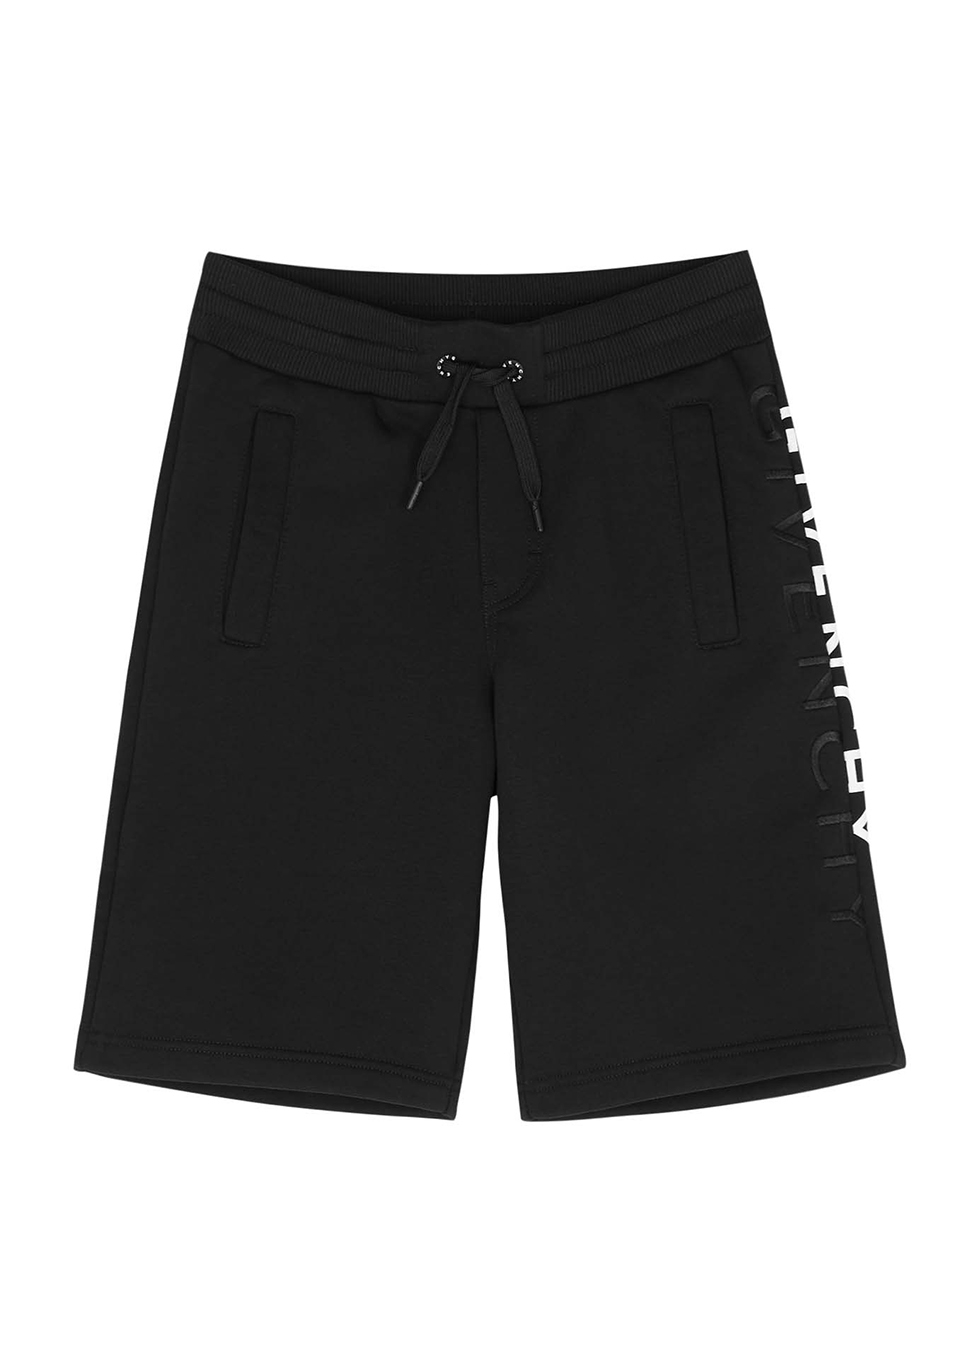 Black logo cotton-blend shorts (6-12 years)